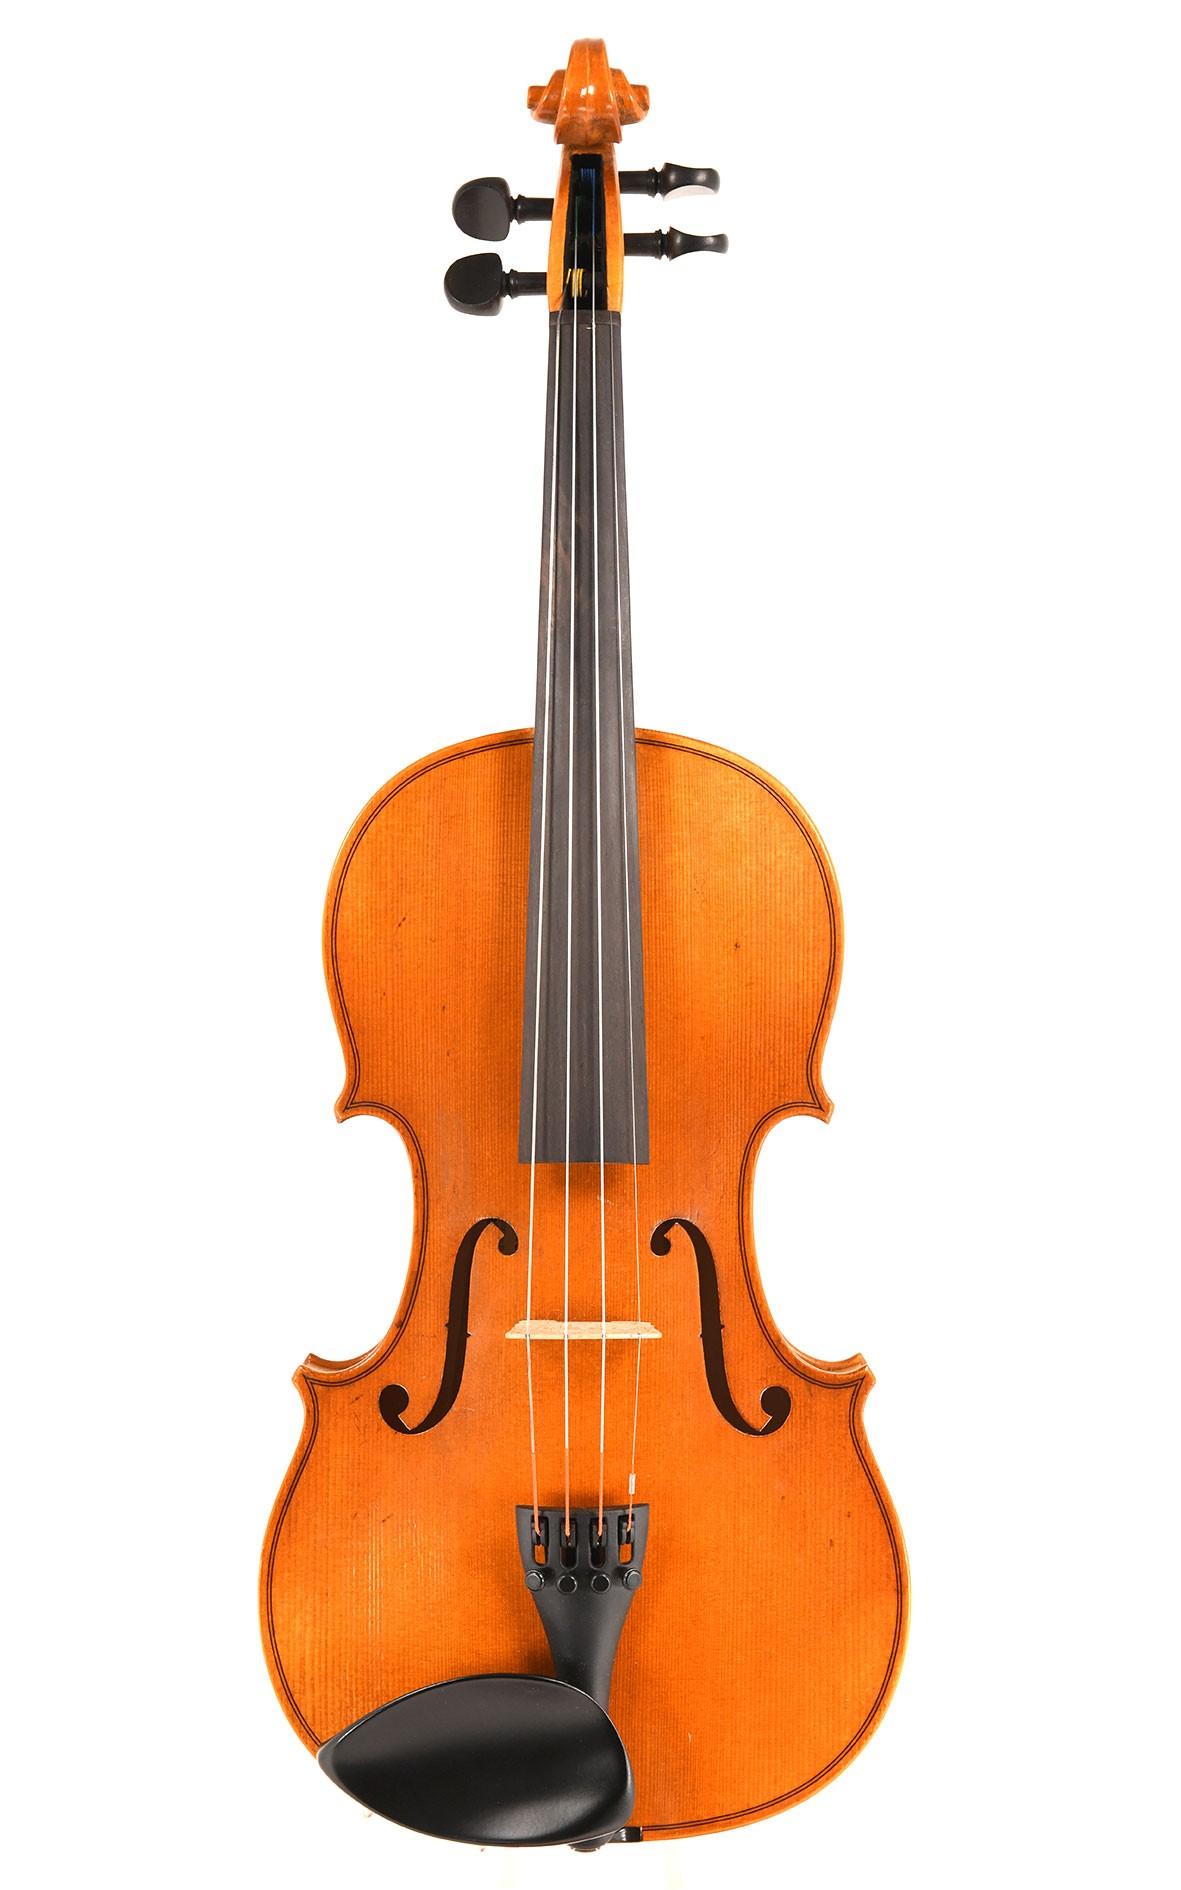 German violin by Roderich Paesold